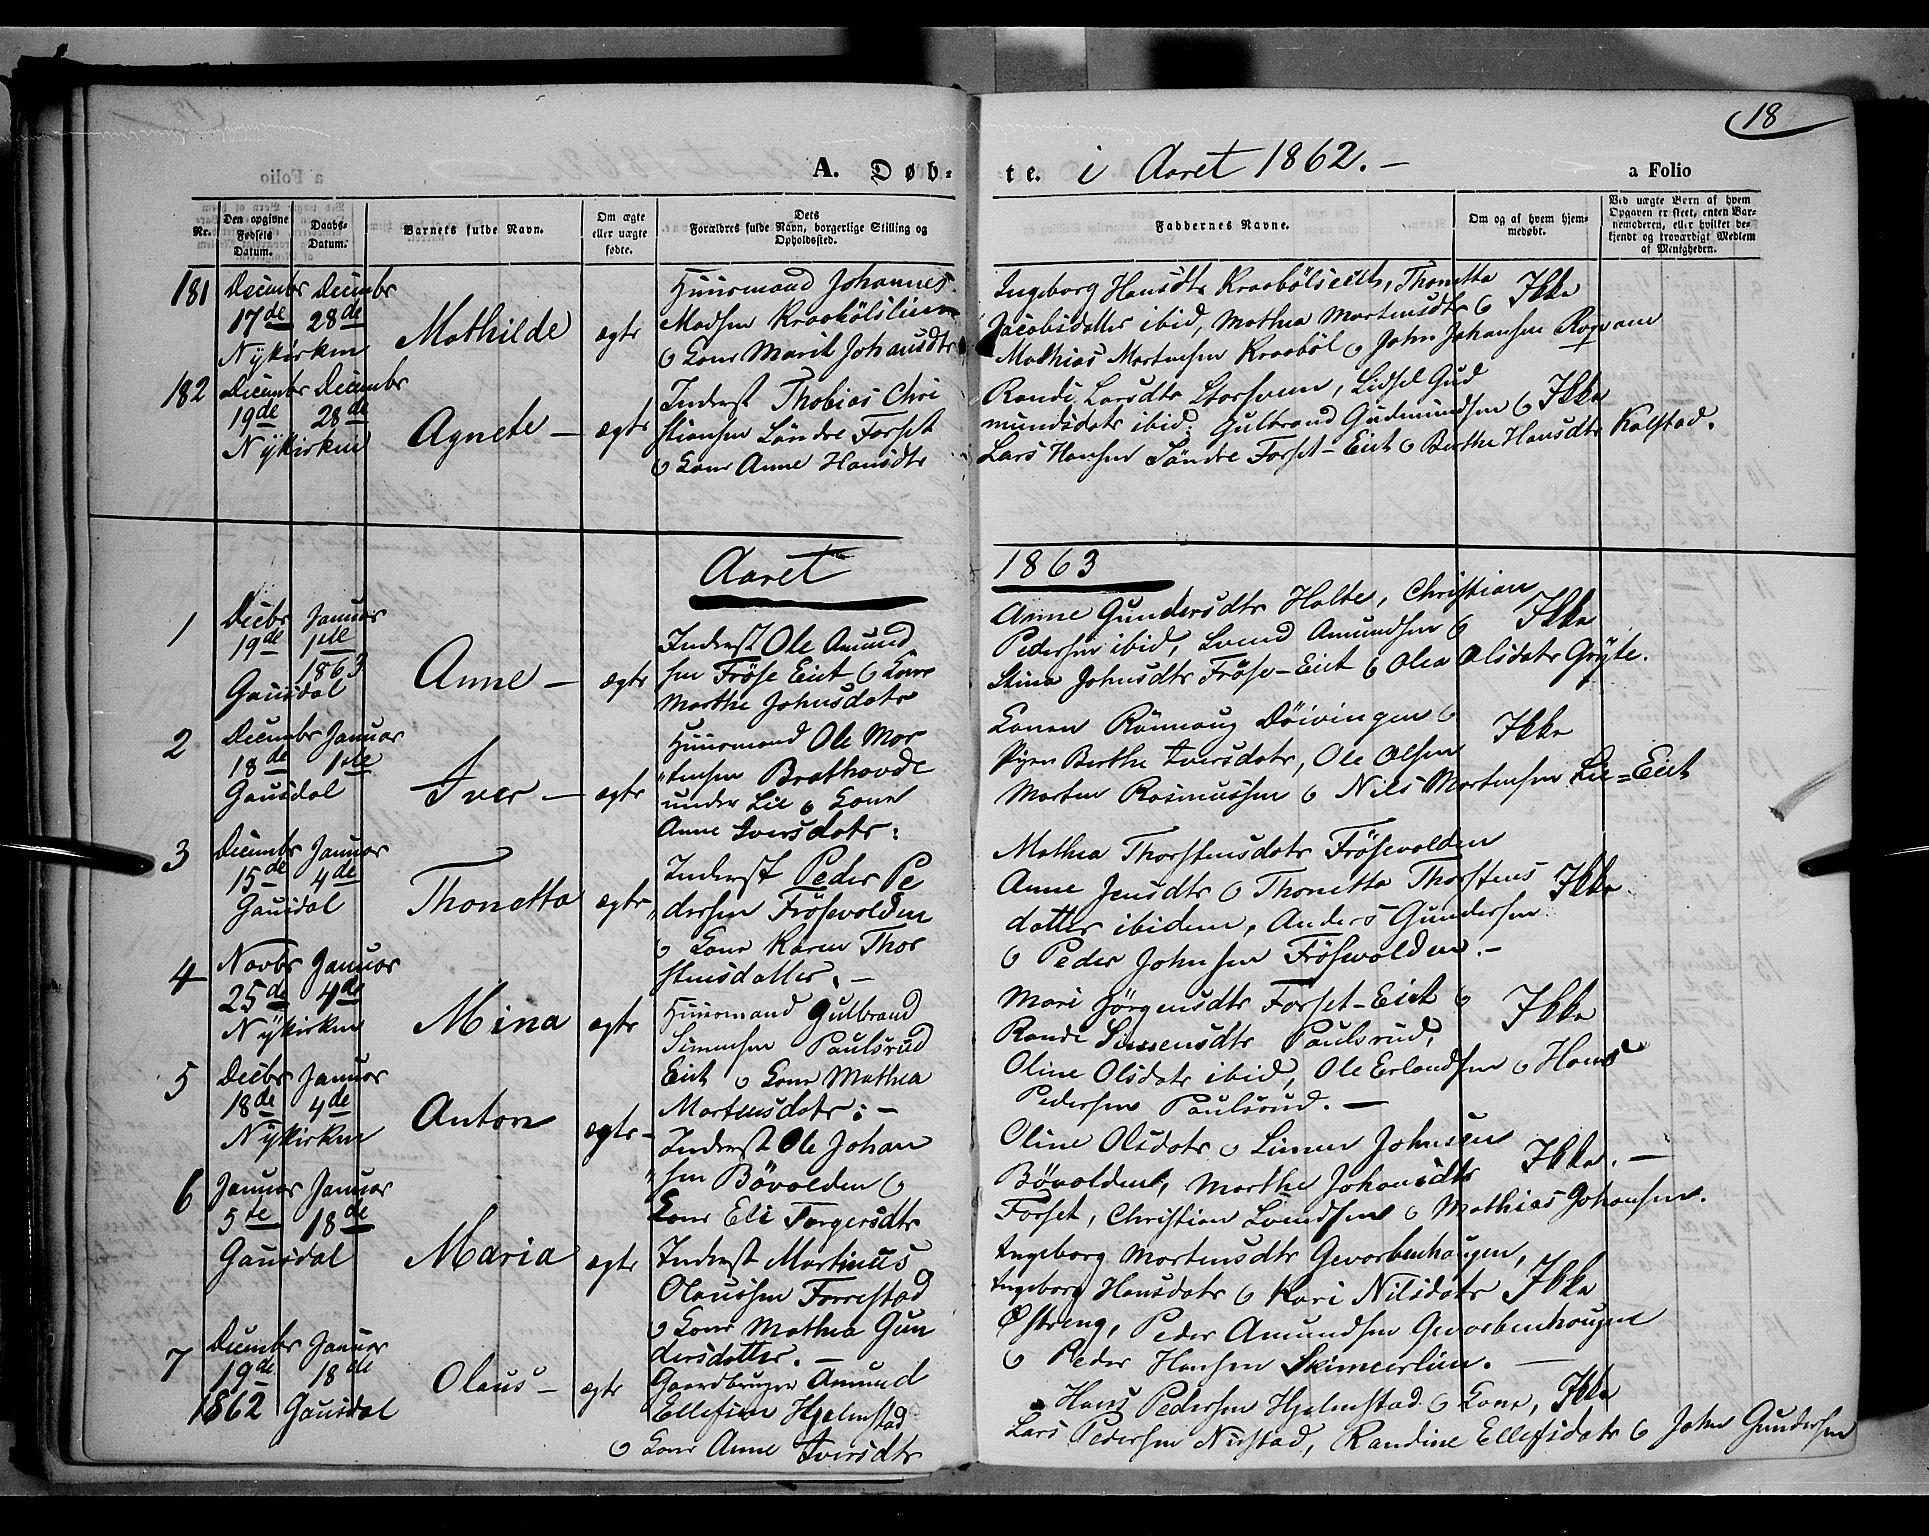 SAH, Gausdal prestekontor, Ministerialbok nr. 9, 1862-1873, s. 18